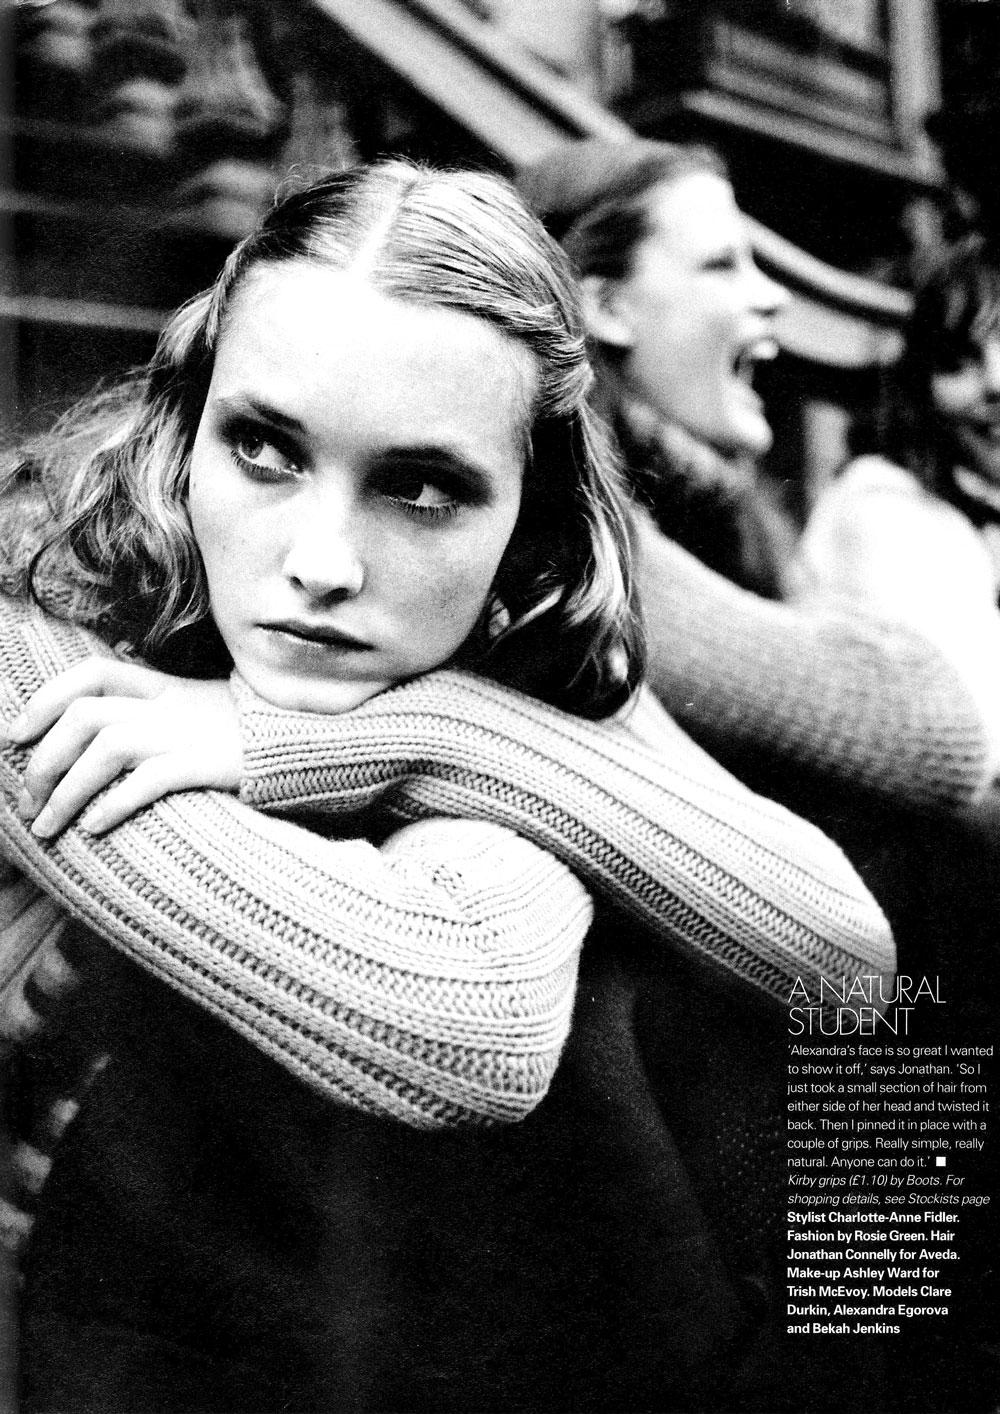 Alexandra Egorova Elle UK via fashioned by love